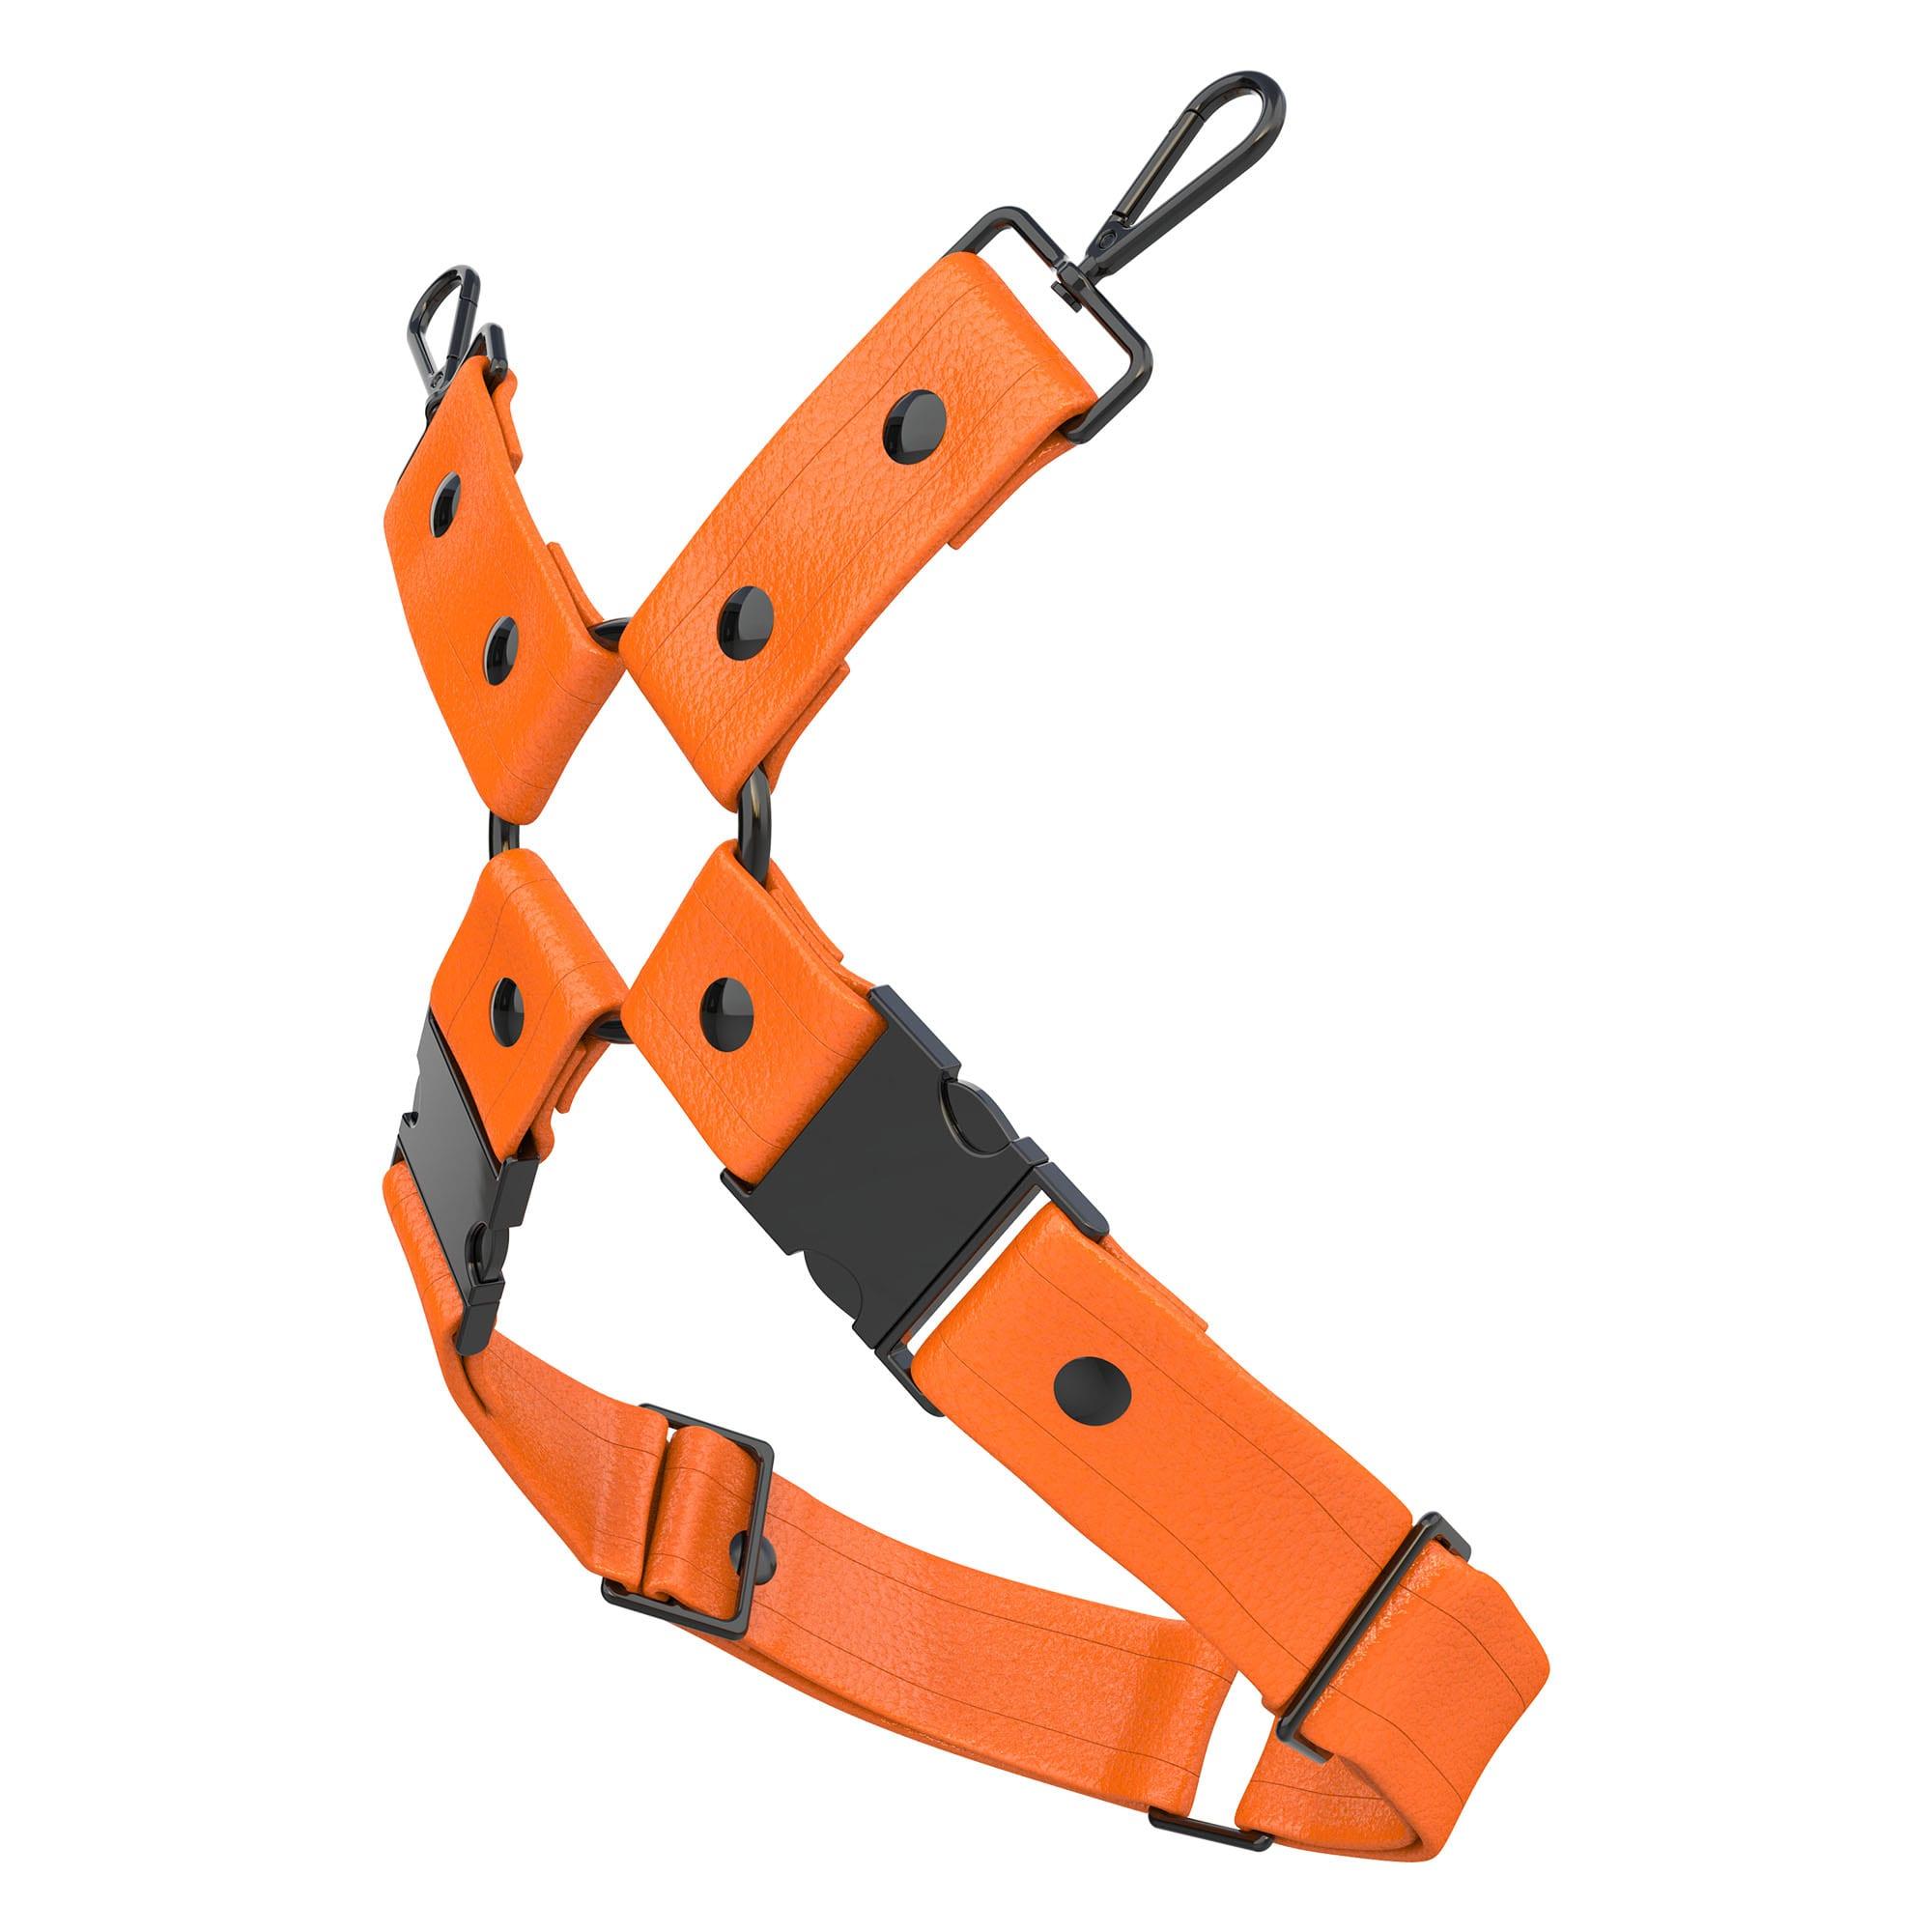 One Size Leg Harness – Standard Leather – Orange - Black Metal Fittings